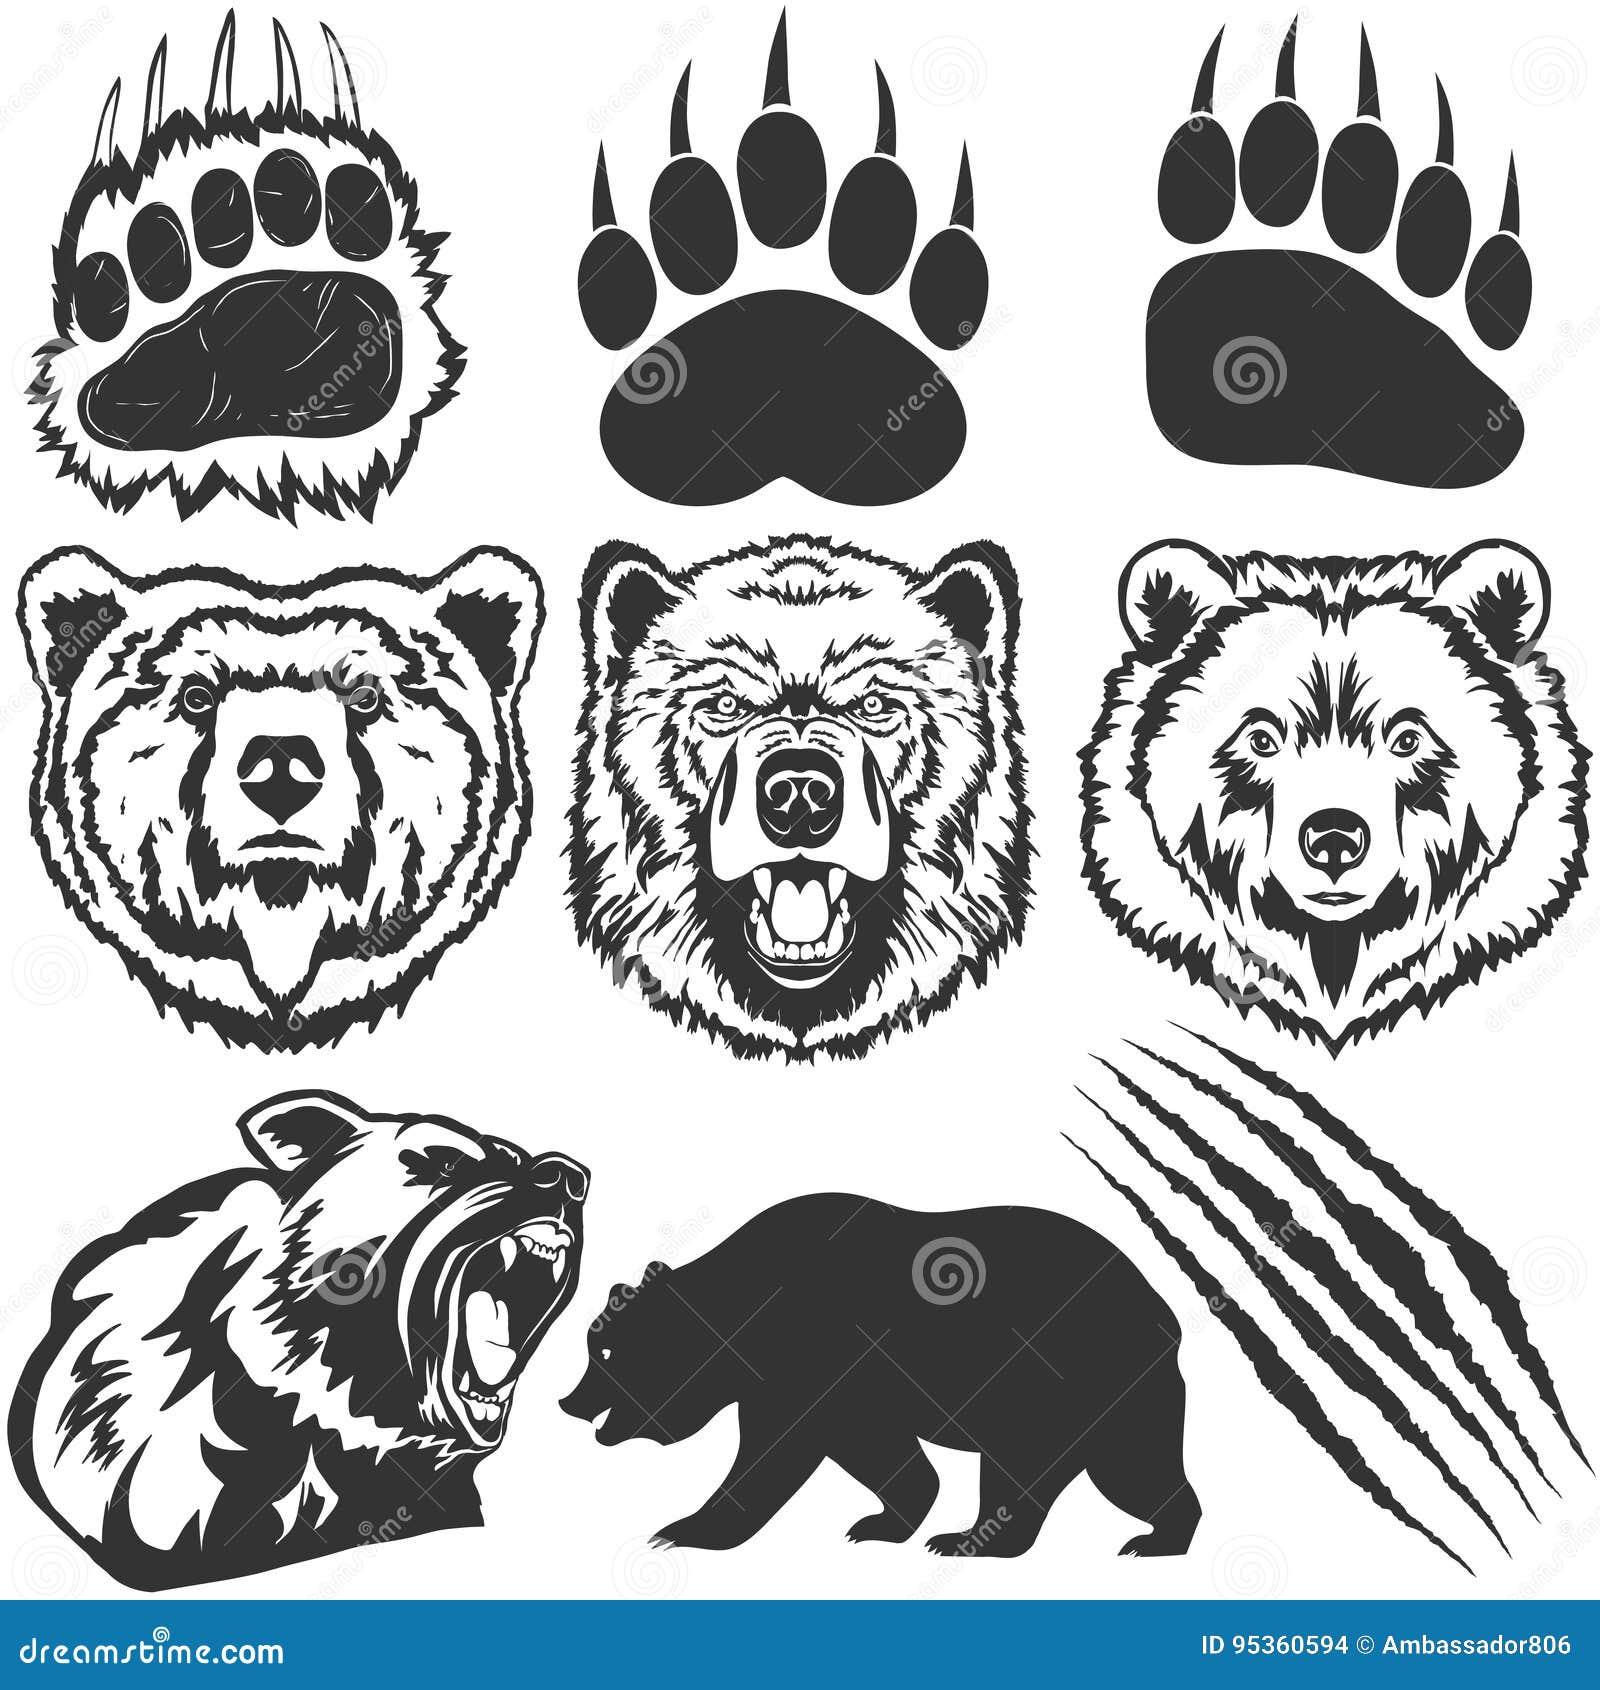 bear claw thumbs